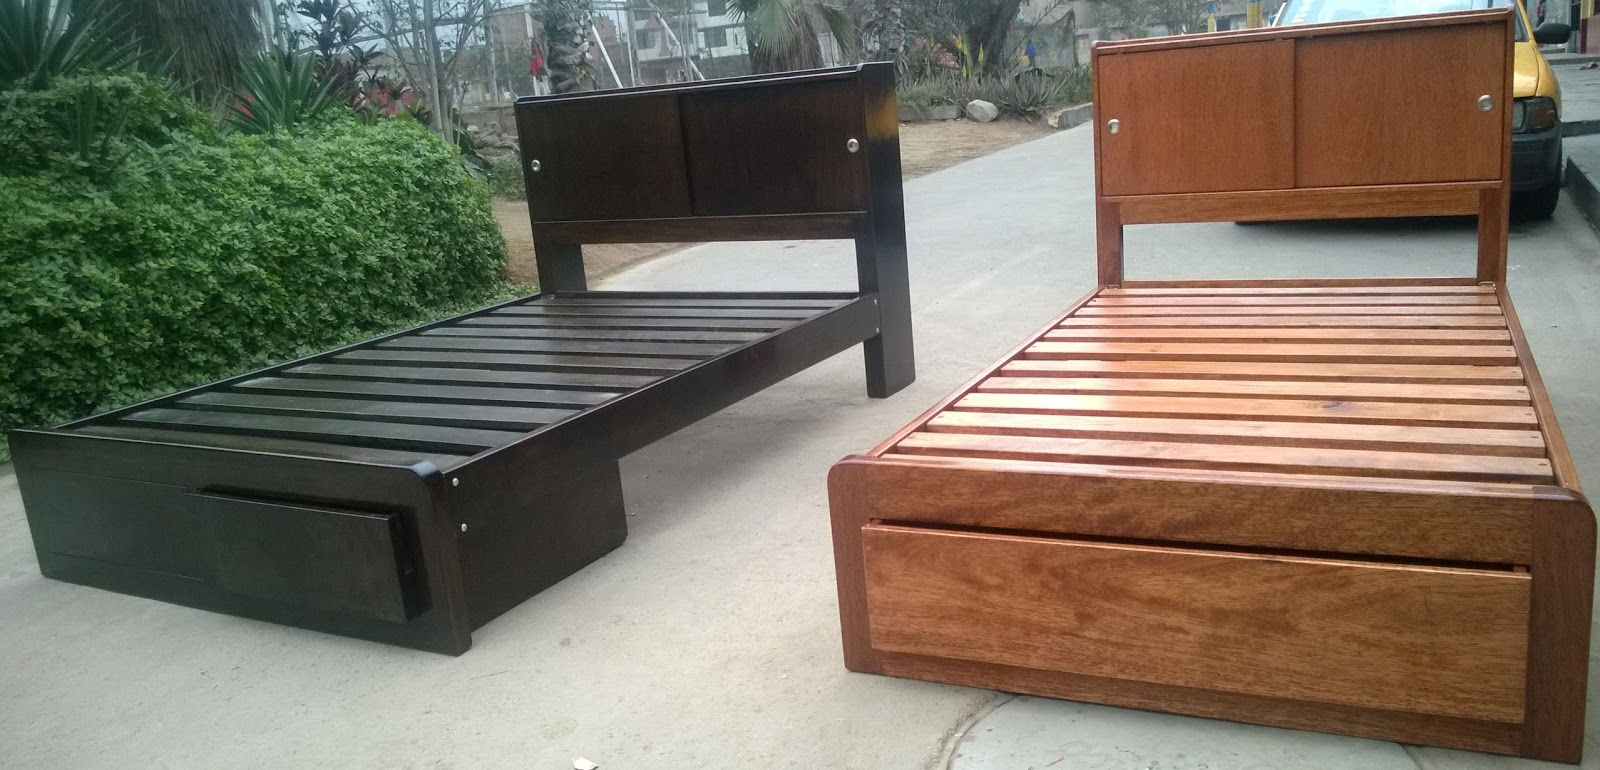 Cama de dos plazas modelos exclusivos carpinter a - Camas de obra ...